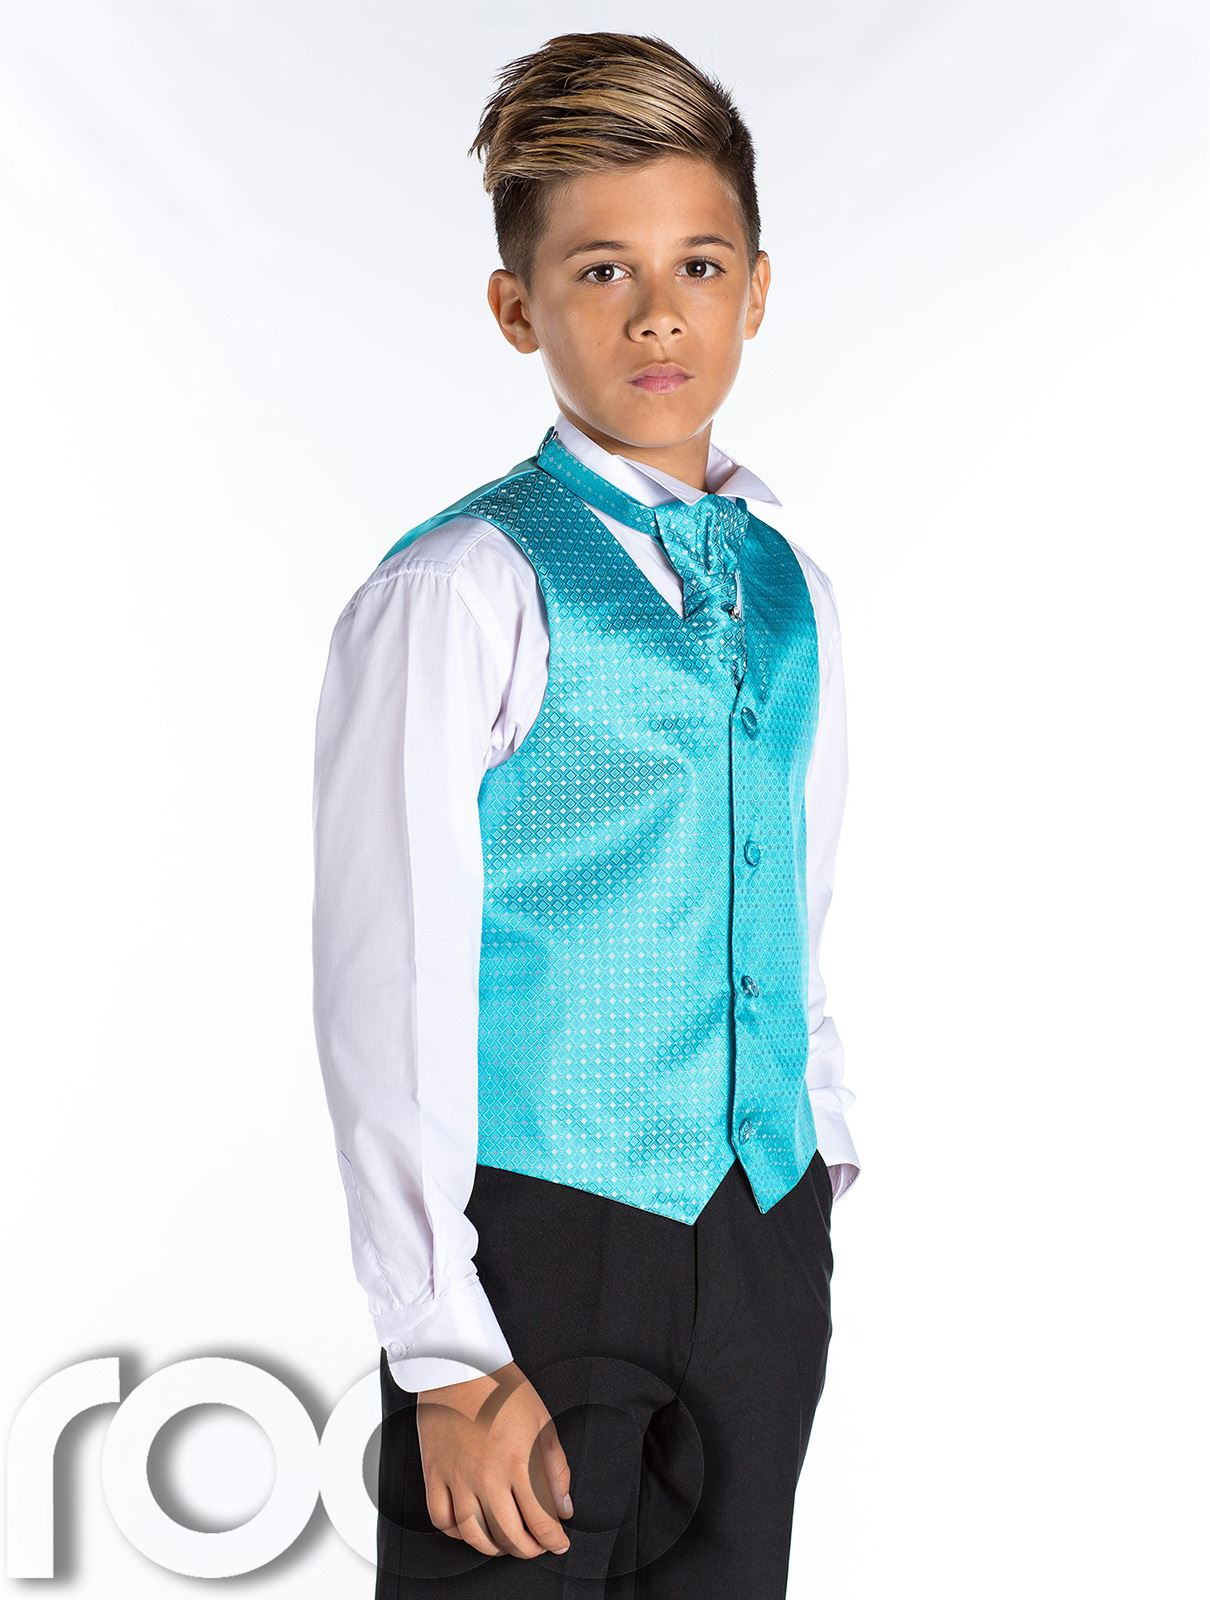 Page Boy Suits Boys Wedding Suits Boys Waistcoat Suit Black Trousers